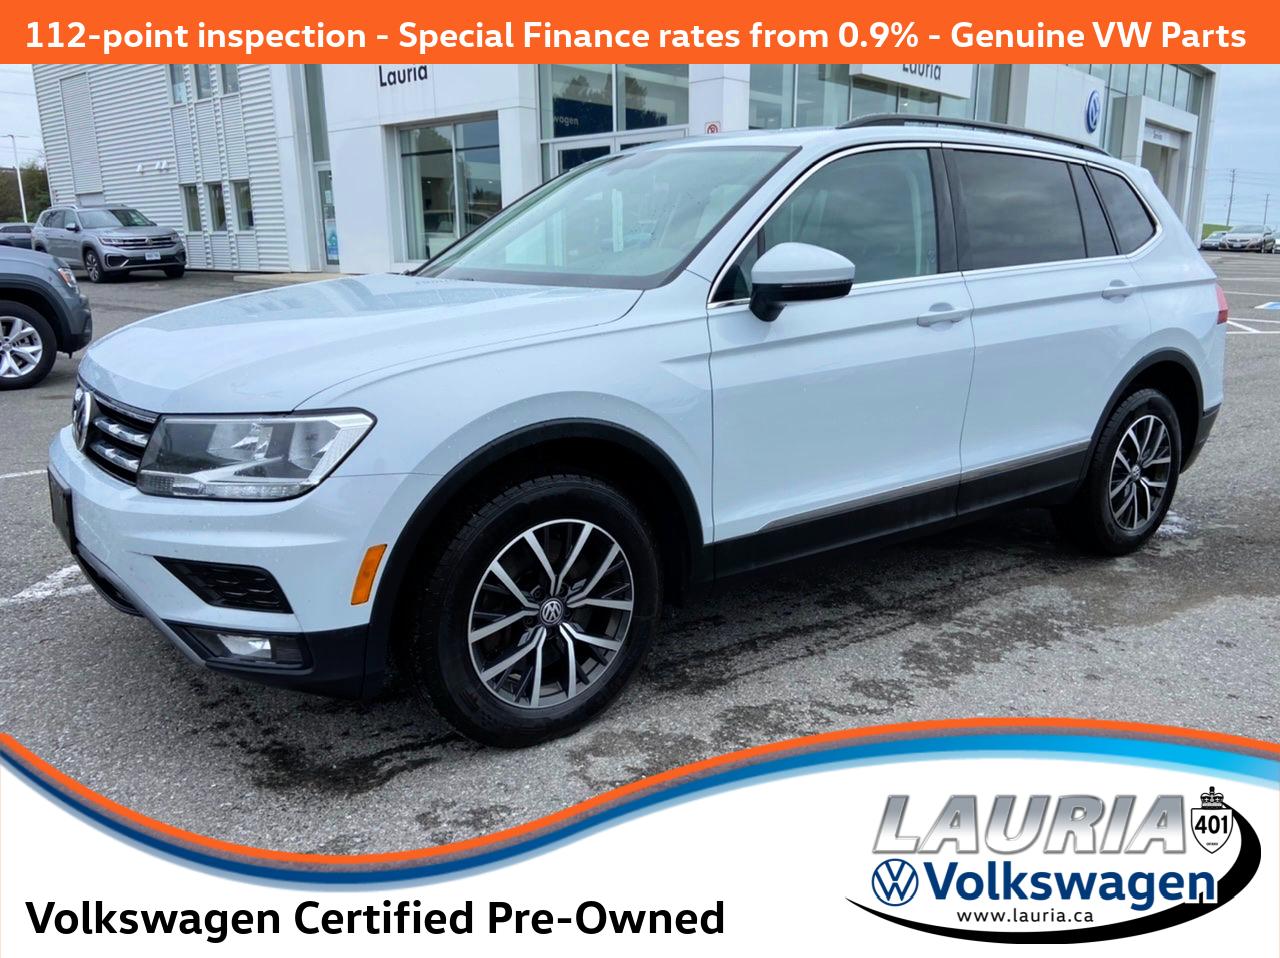 used 2018 Volkswagen Tiguan car, priced at $26,888